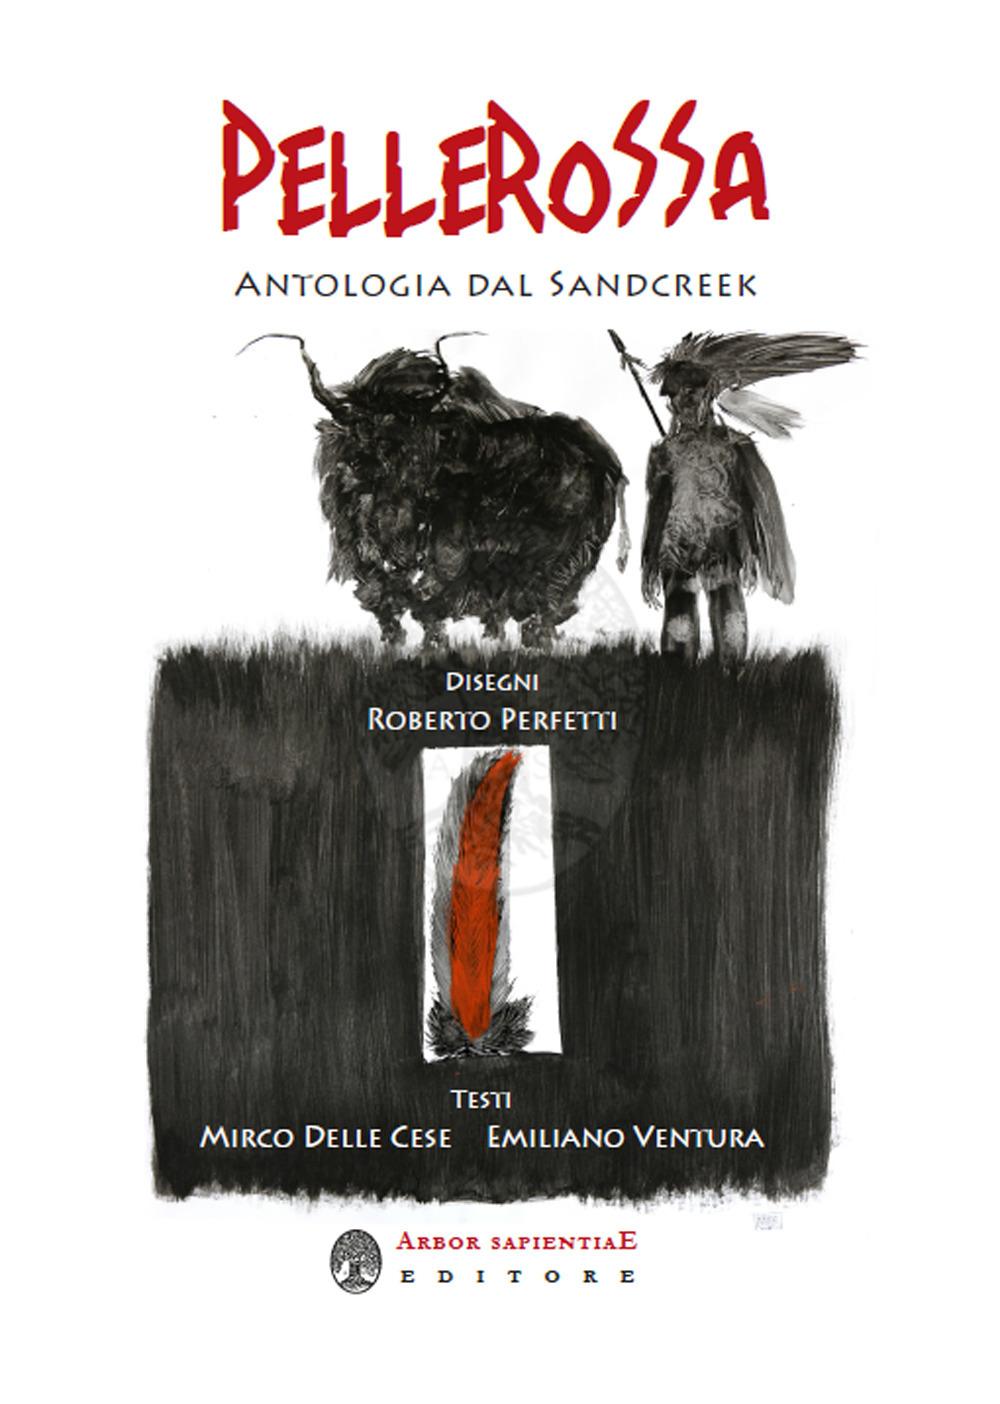 Image of Pellerossa. Antologia dal Sandcreek